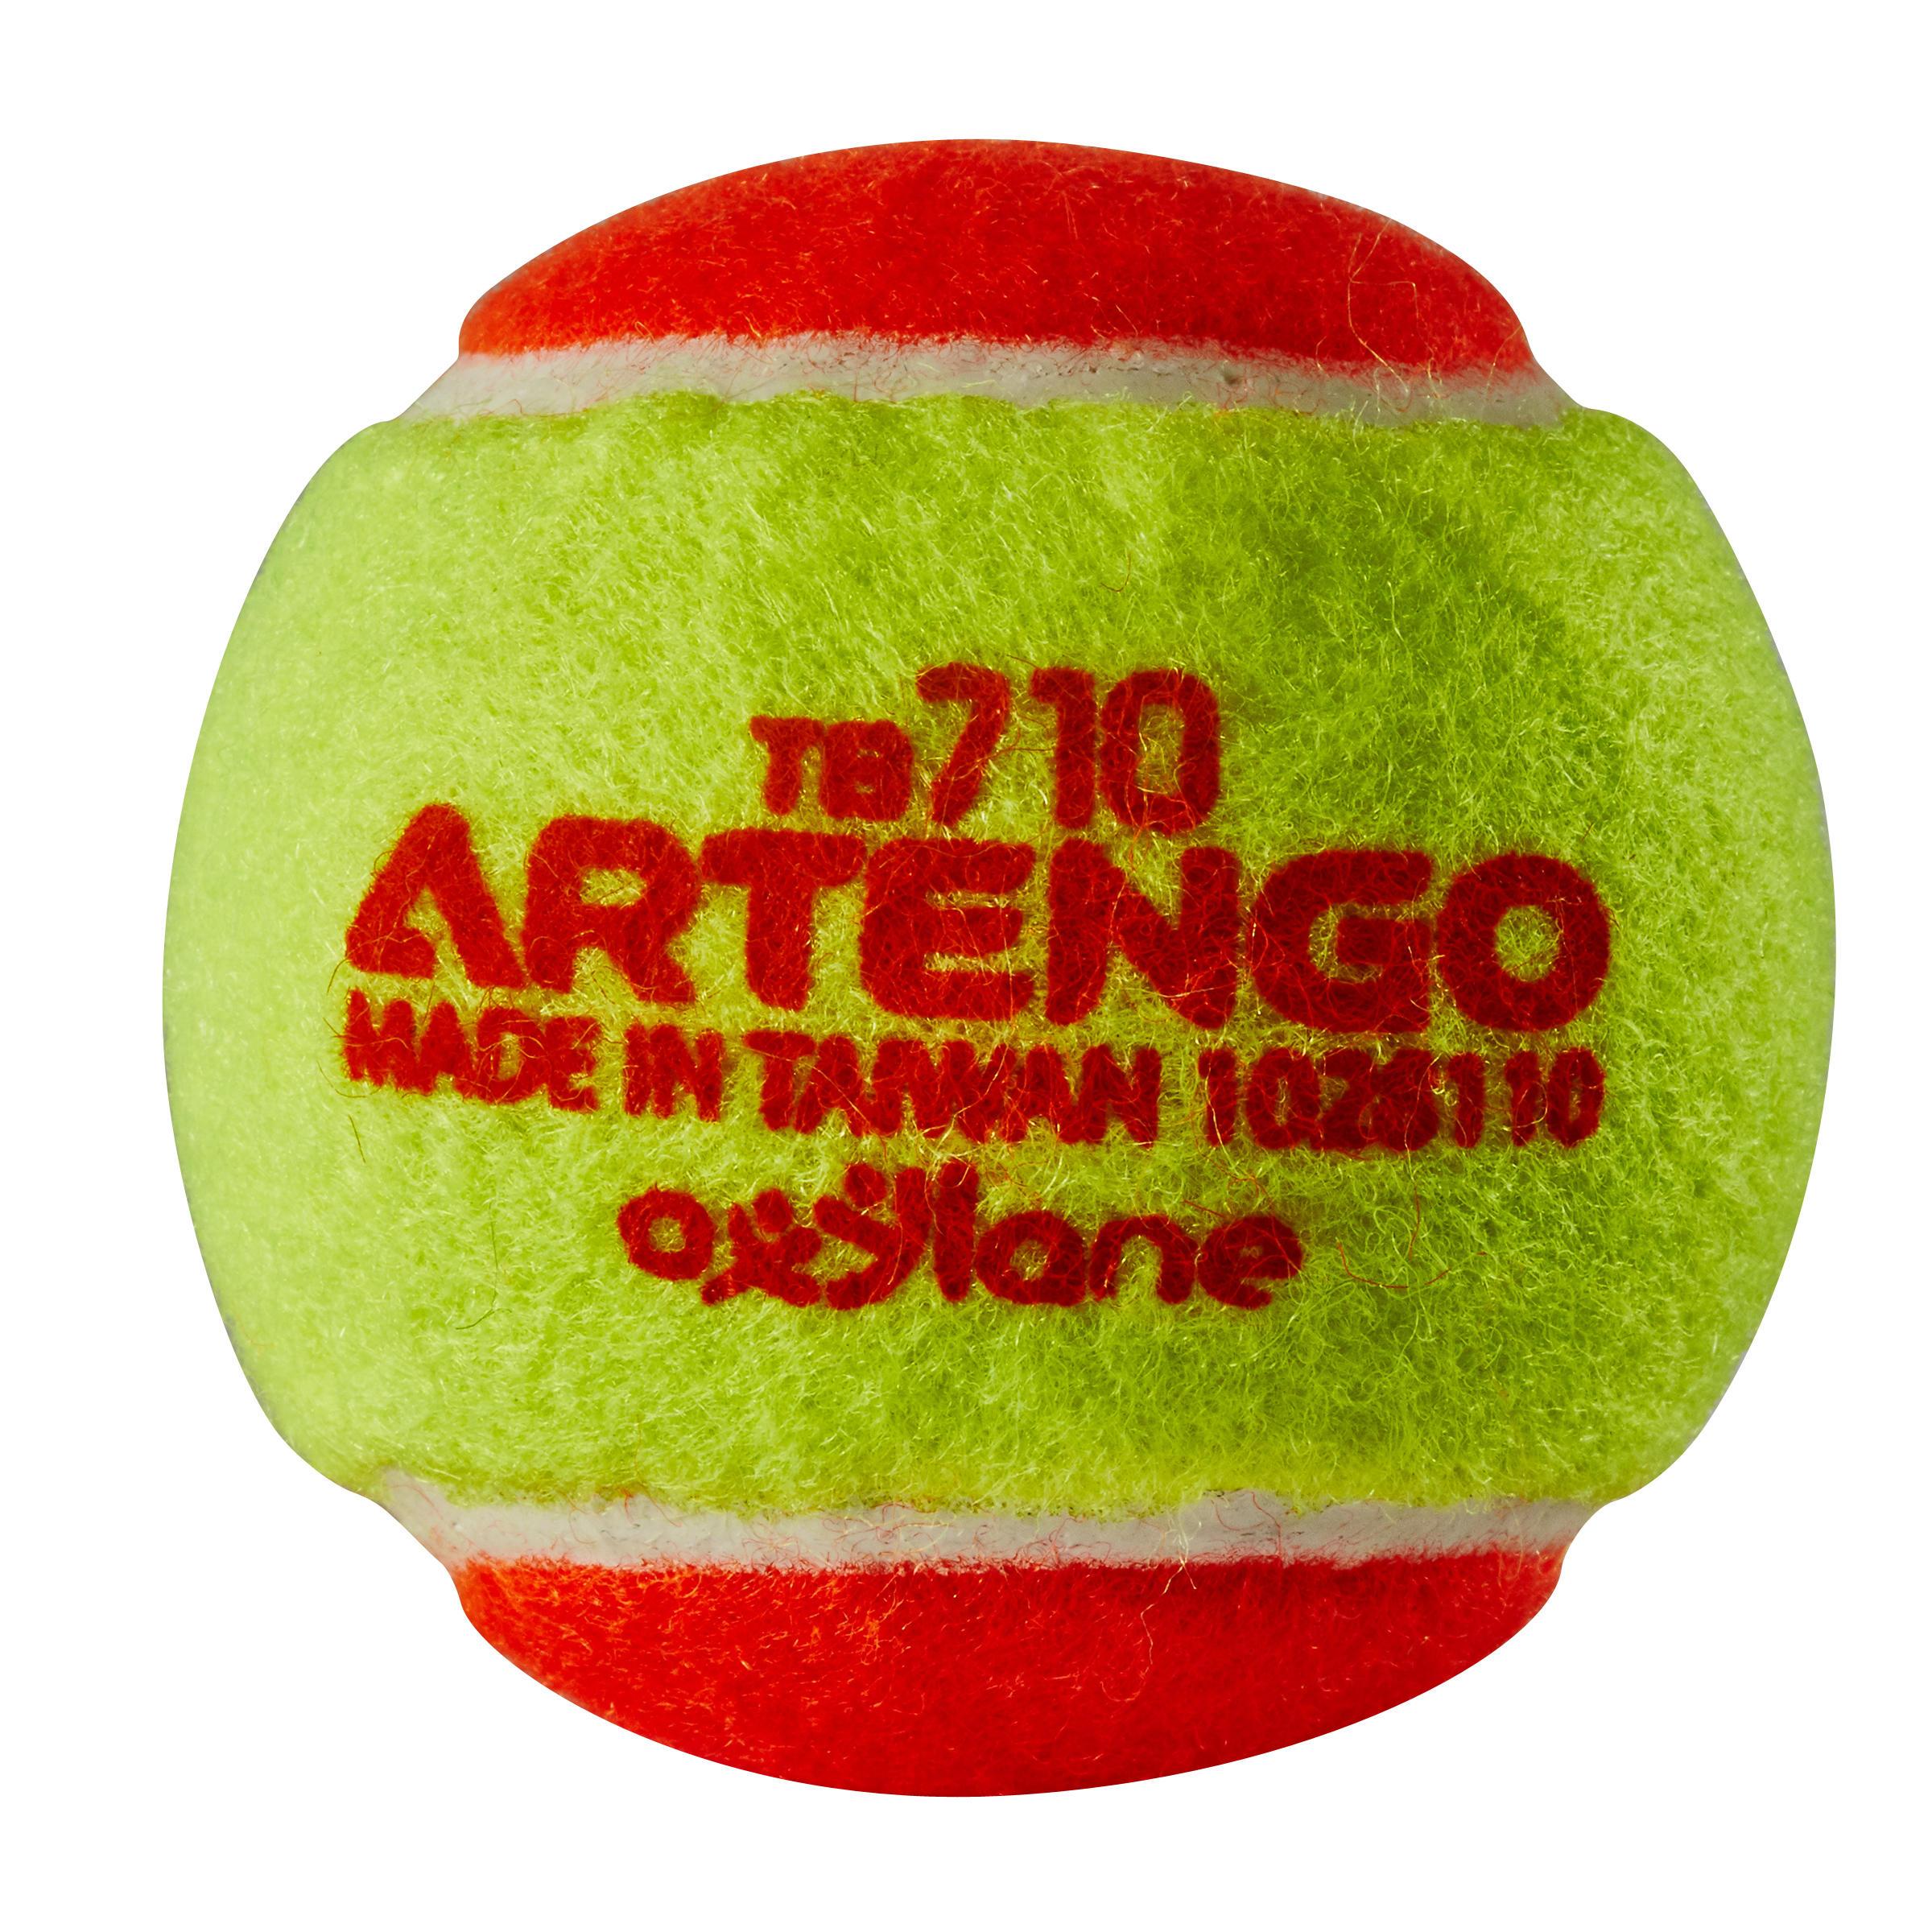 TENNIS BALL BEGINNER TB110 - ORANGE